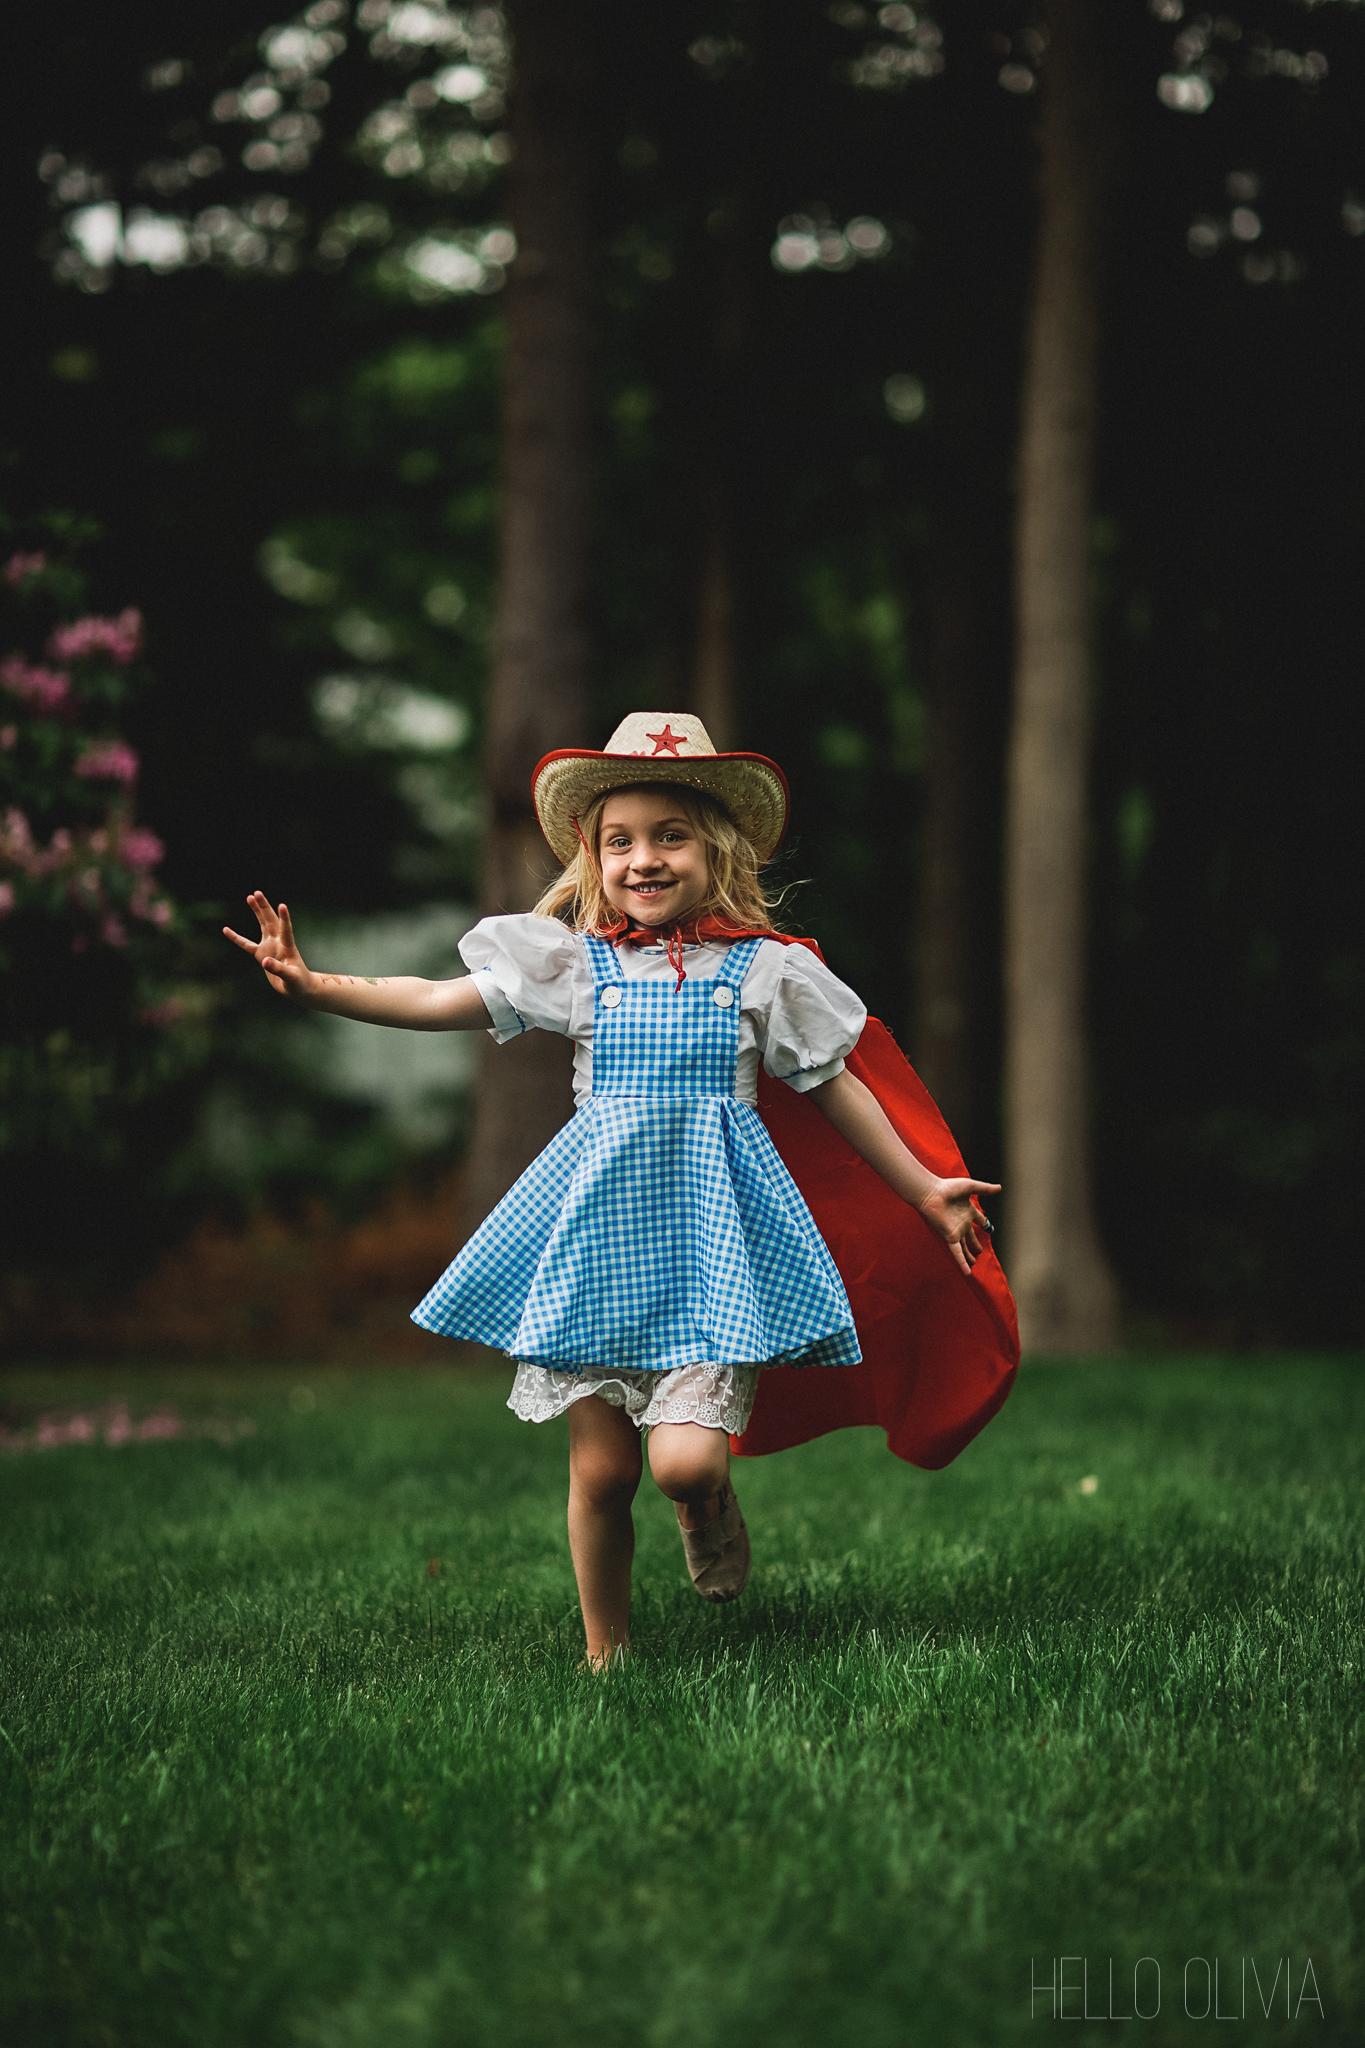 Hello-olivia-photography-long-island-family-photographer-children-lifestyle-dress-up